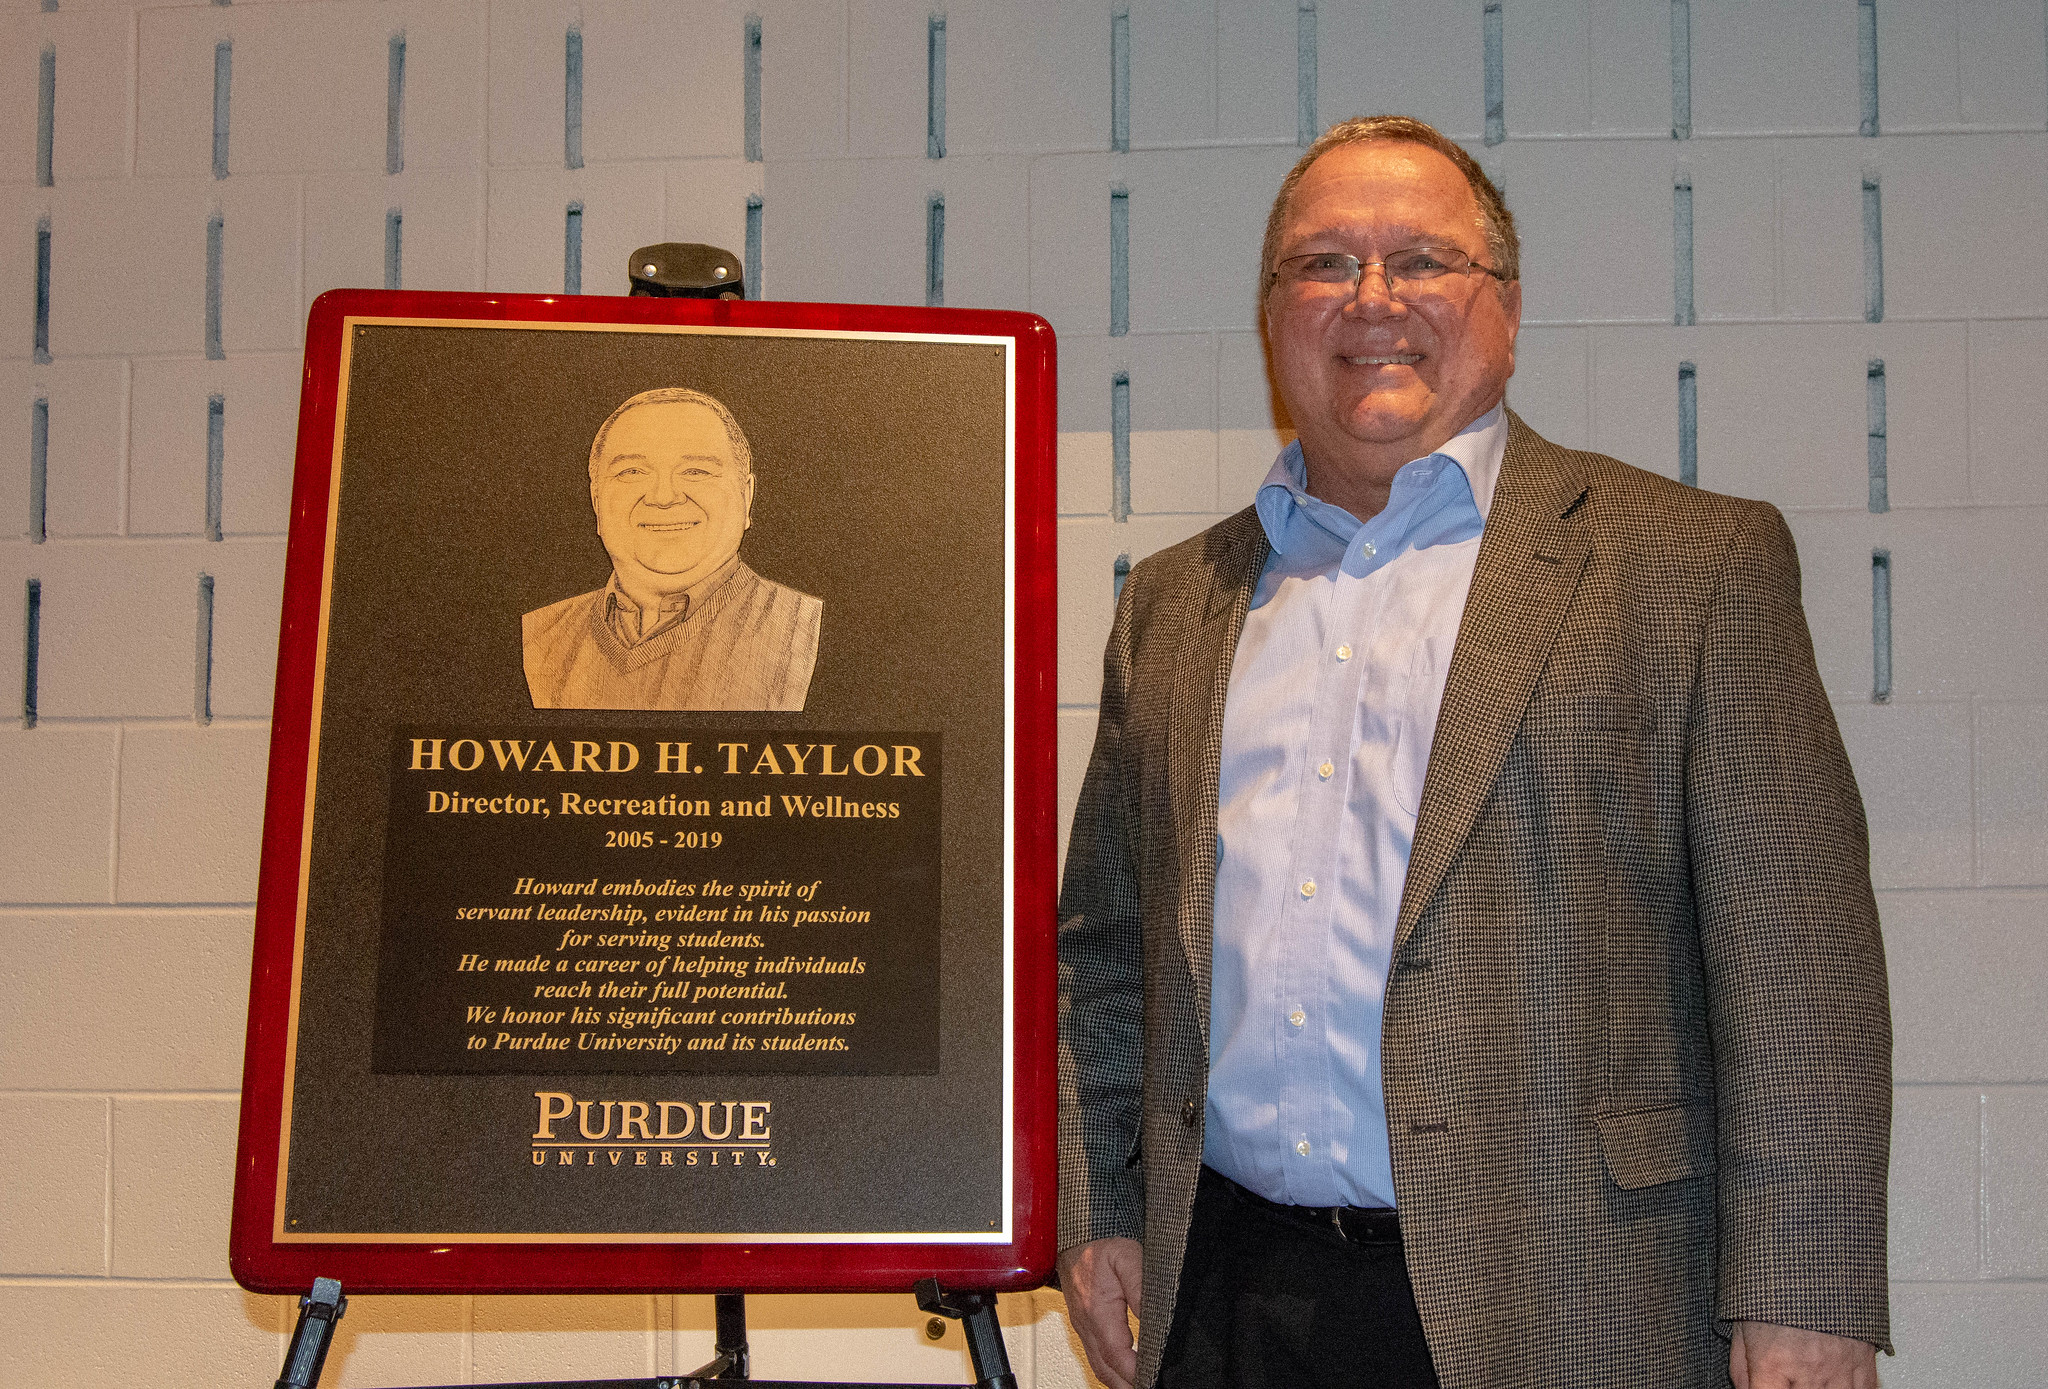 Purdue Recreation & Wellness: Howard Taylor's Retirement Party